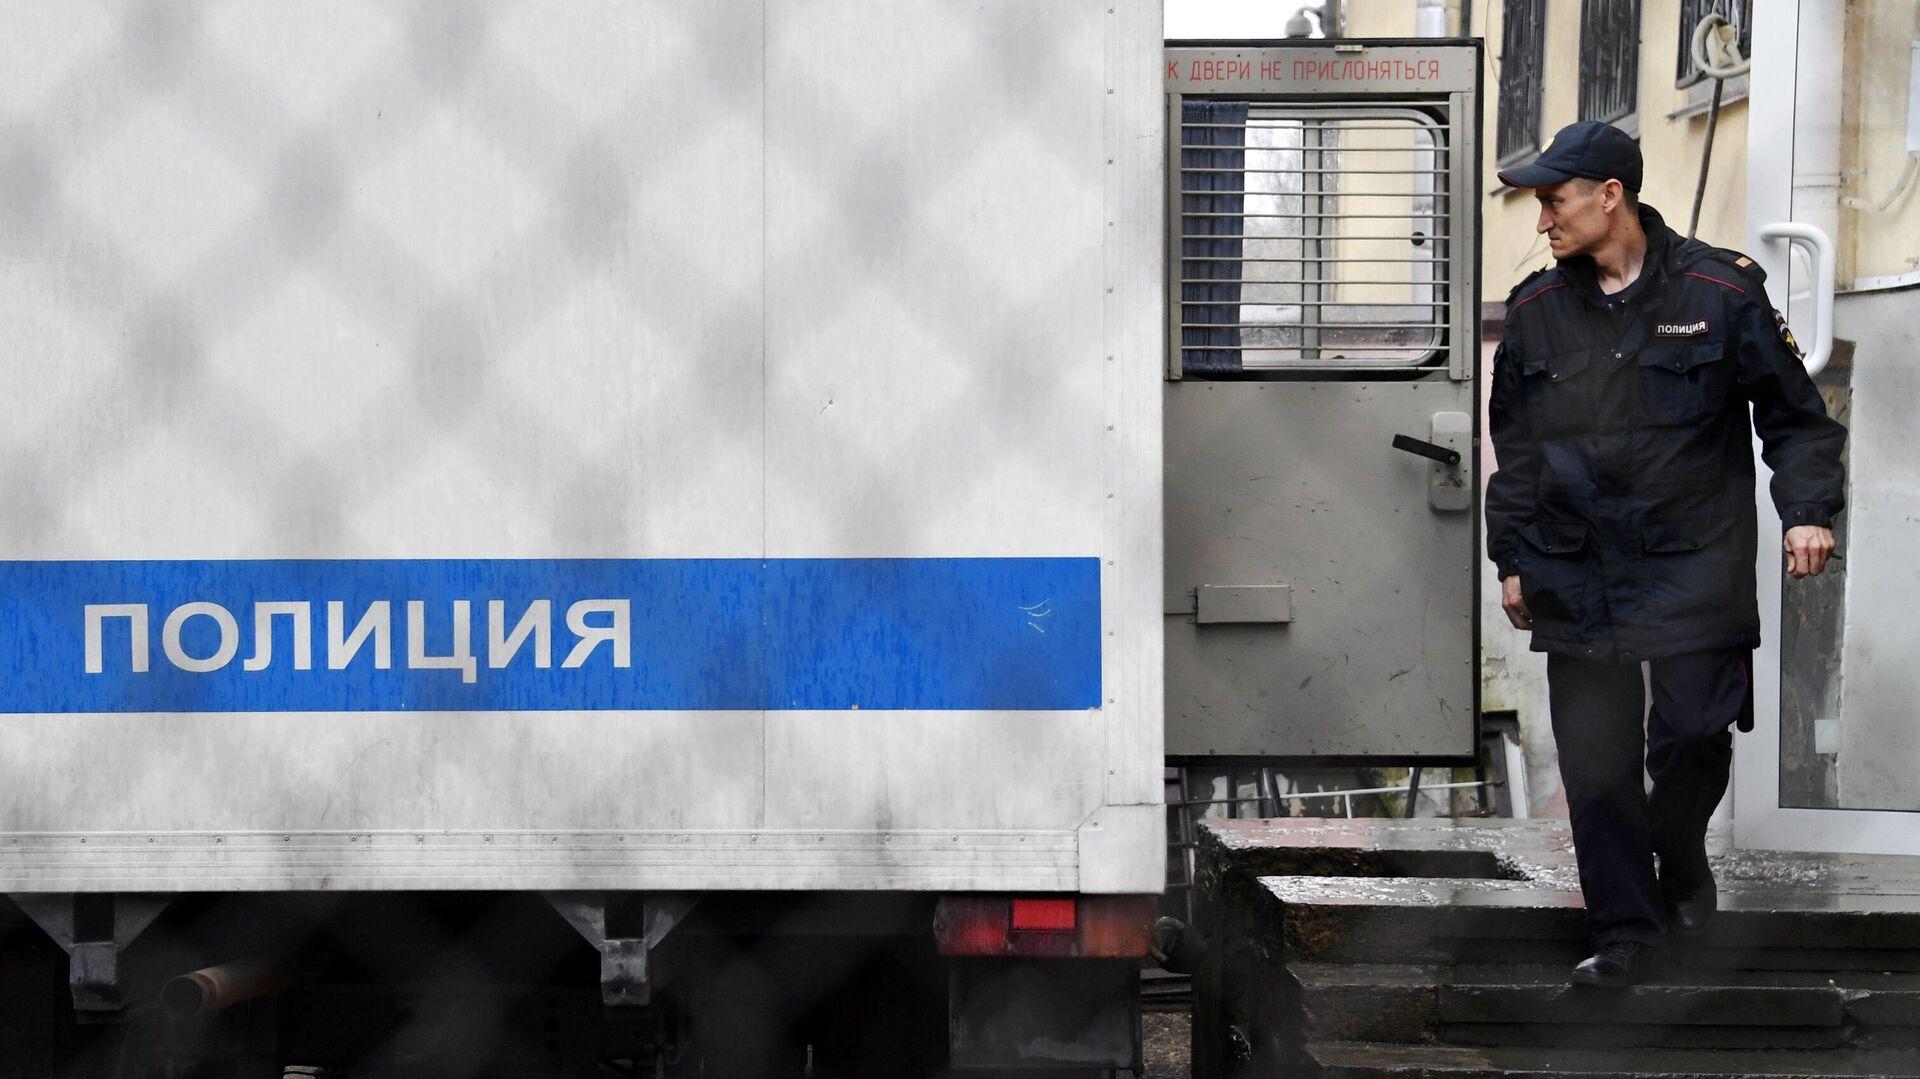 1601608721 0:148:3019:1846 1920x0 80 0 0 5e908752f913e155d3d7ae657256d027 - Группировку скинхедов, нападавшую на бездомных и неформалов, задержали в Красноярске